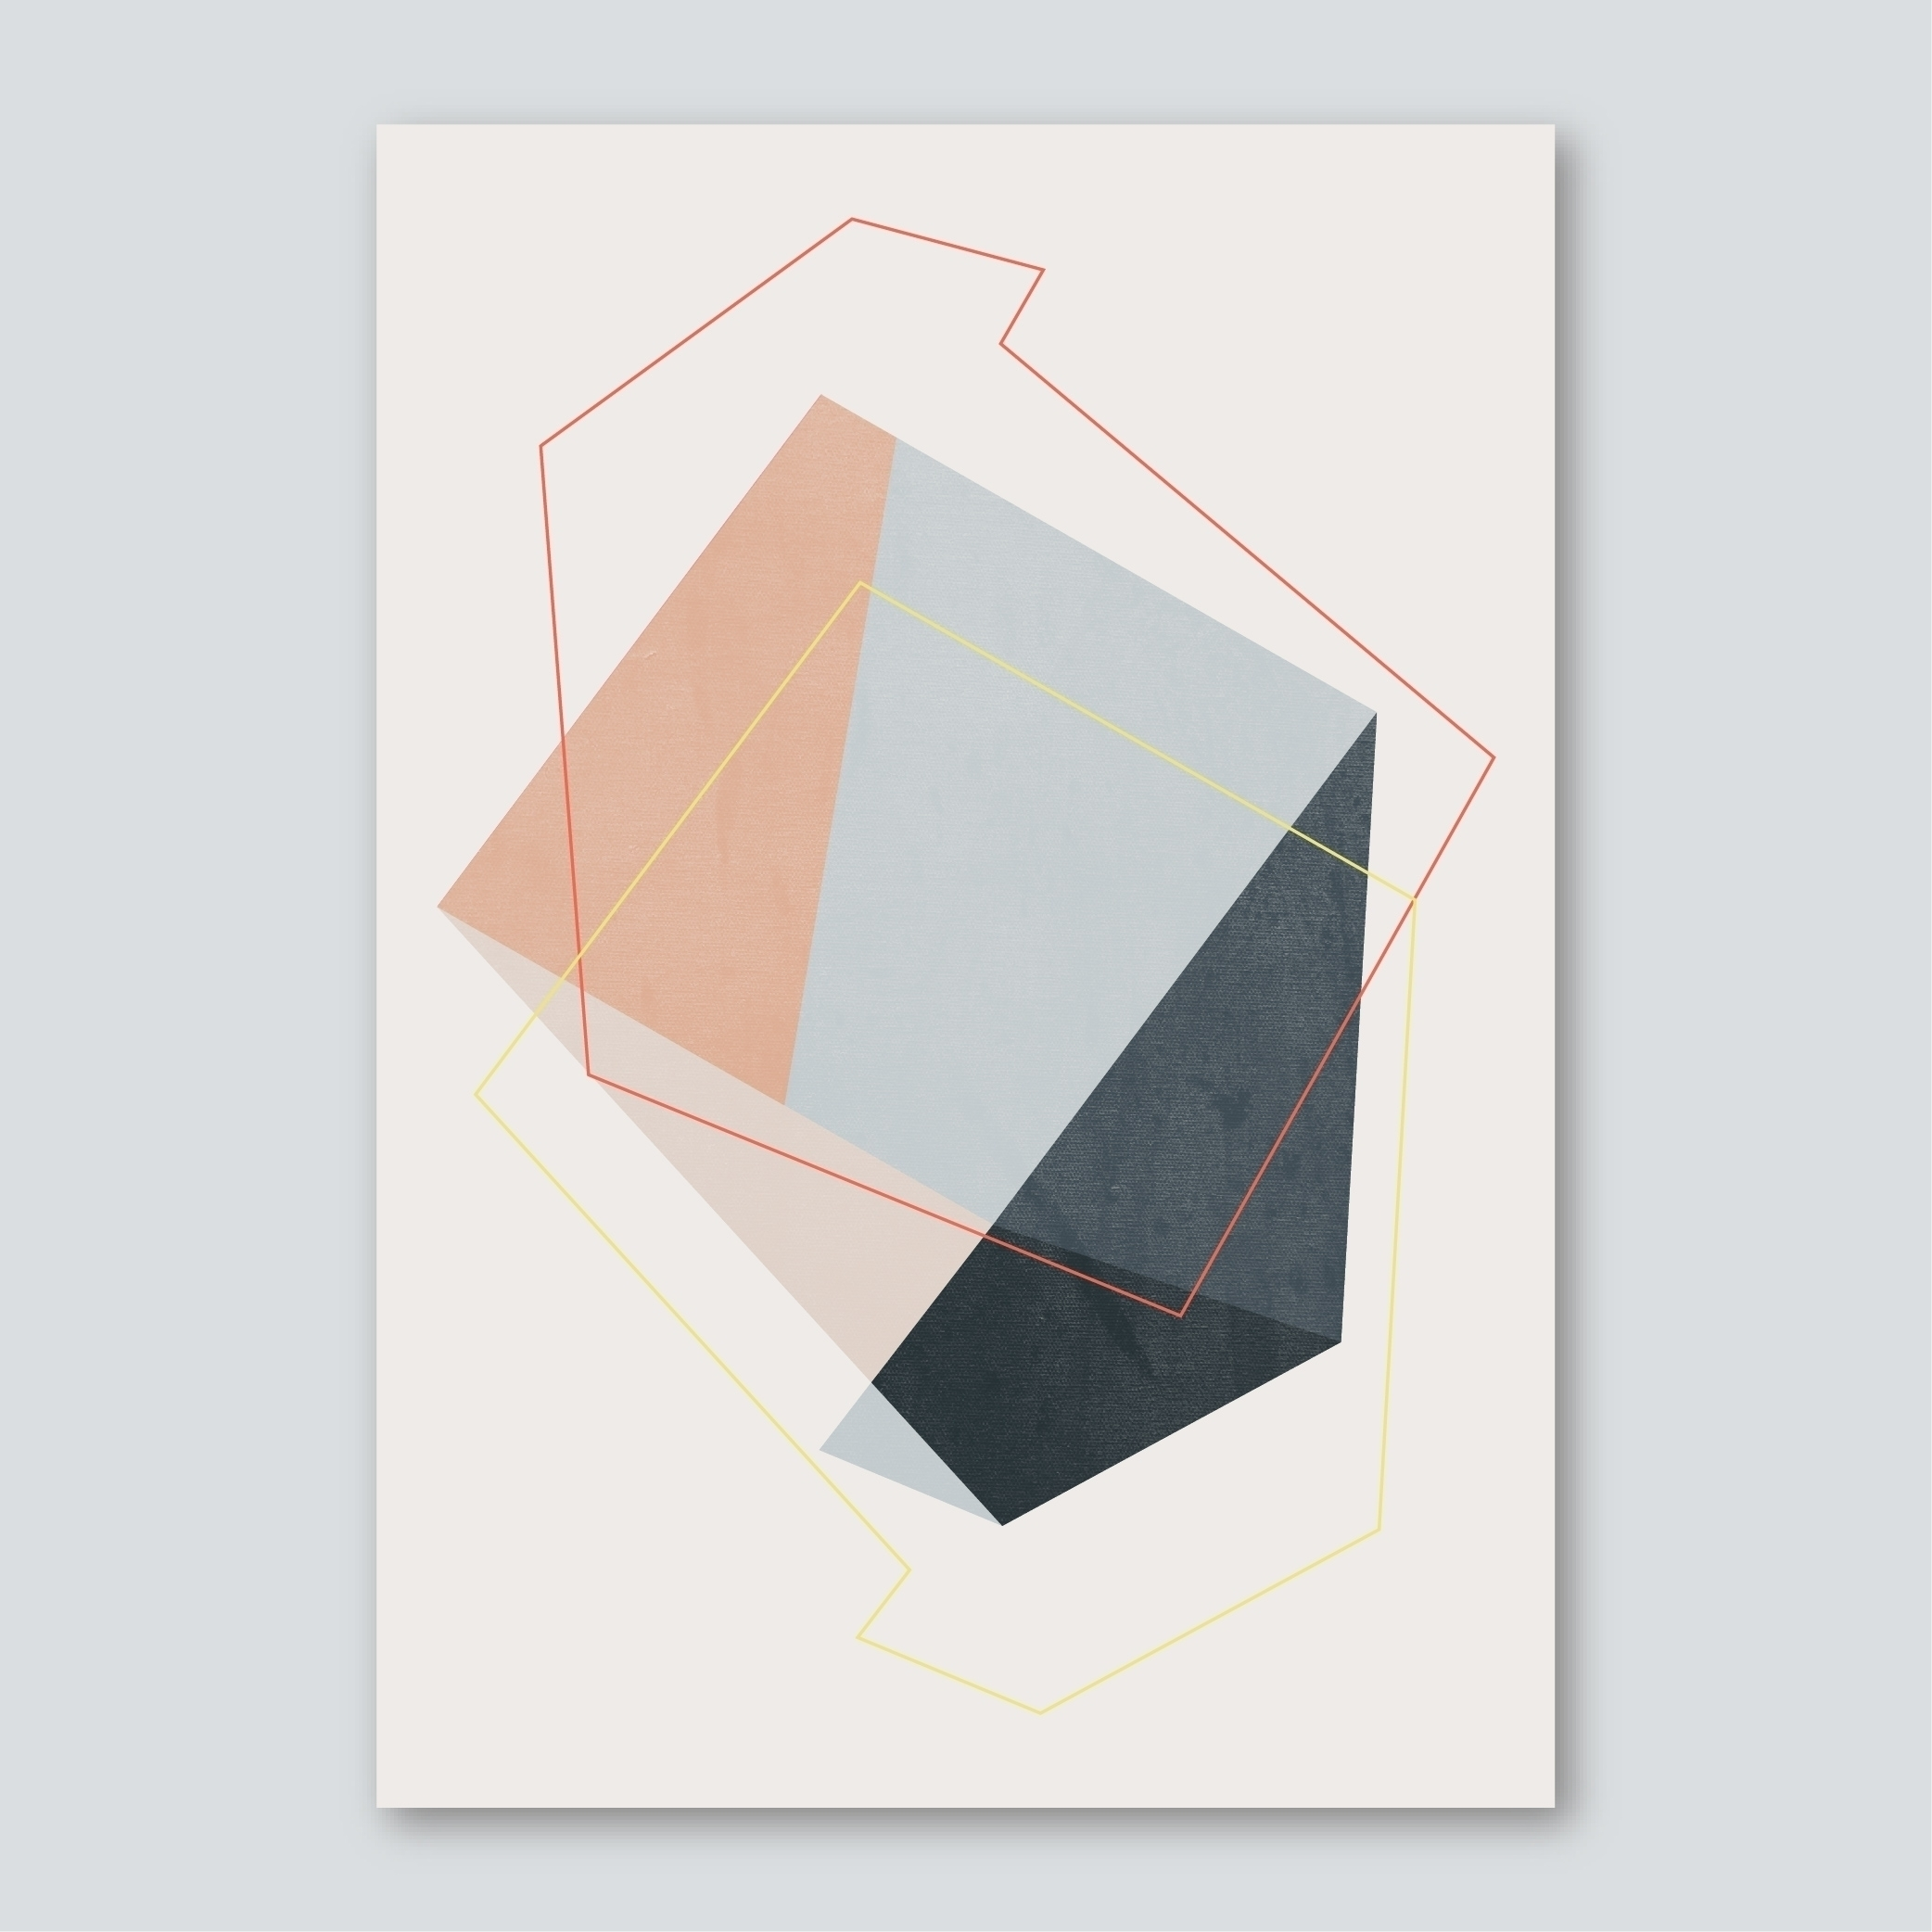 SILENT - digital, geometric, illustration - susanapaz | ello